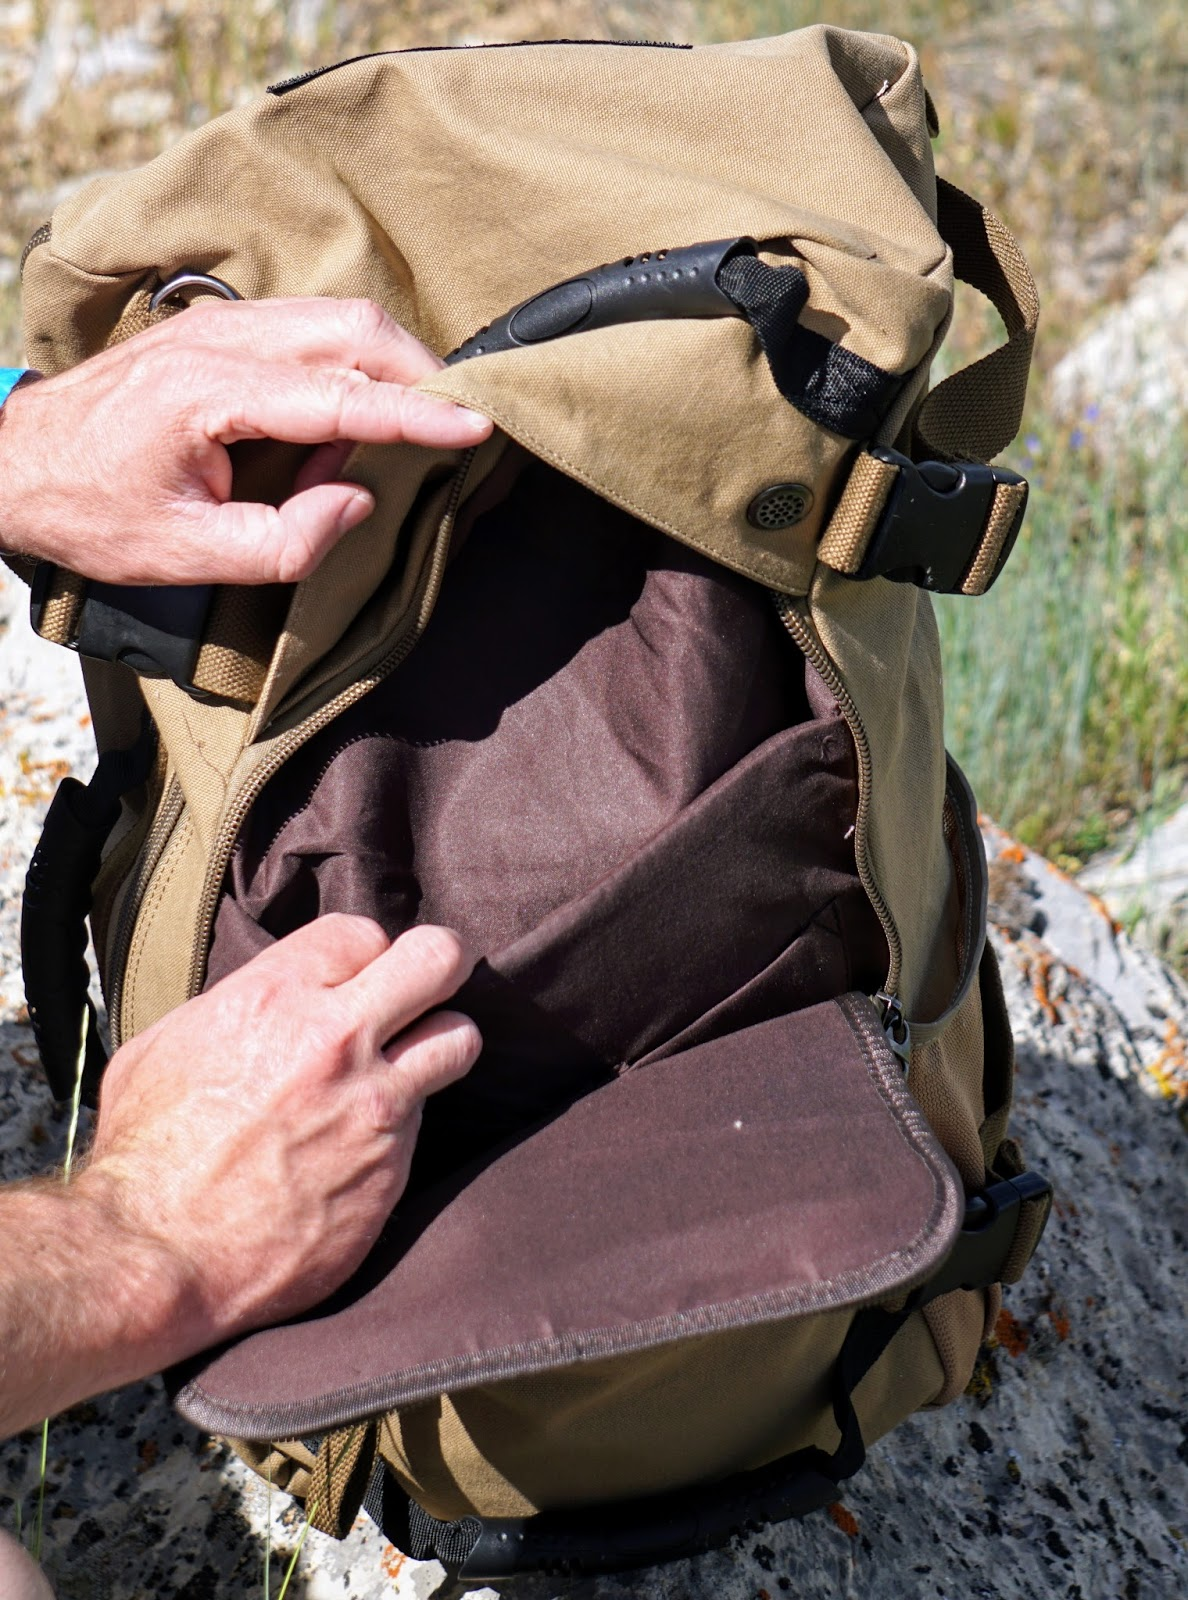 ba5ca6c96c6 Evenflo snugli baby carrier backpack cross country hiking dream jpg  1188x1600 Snugli baby carrier for hiking